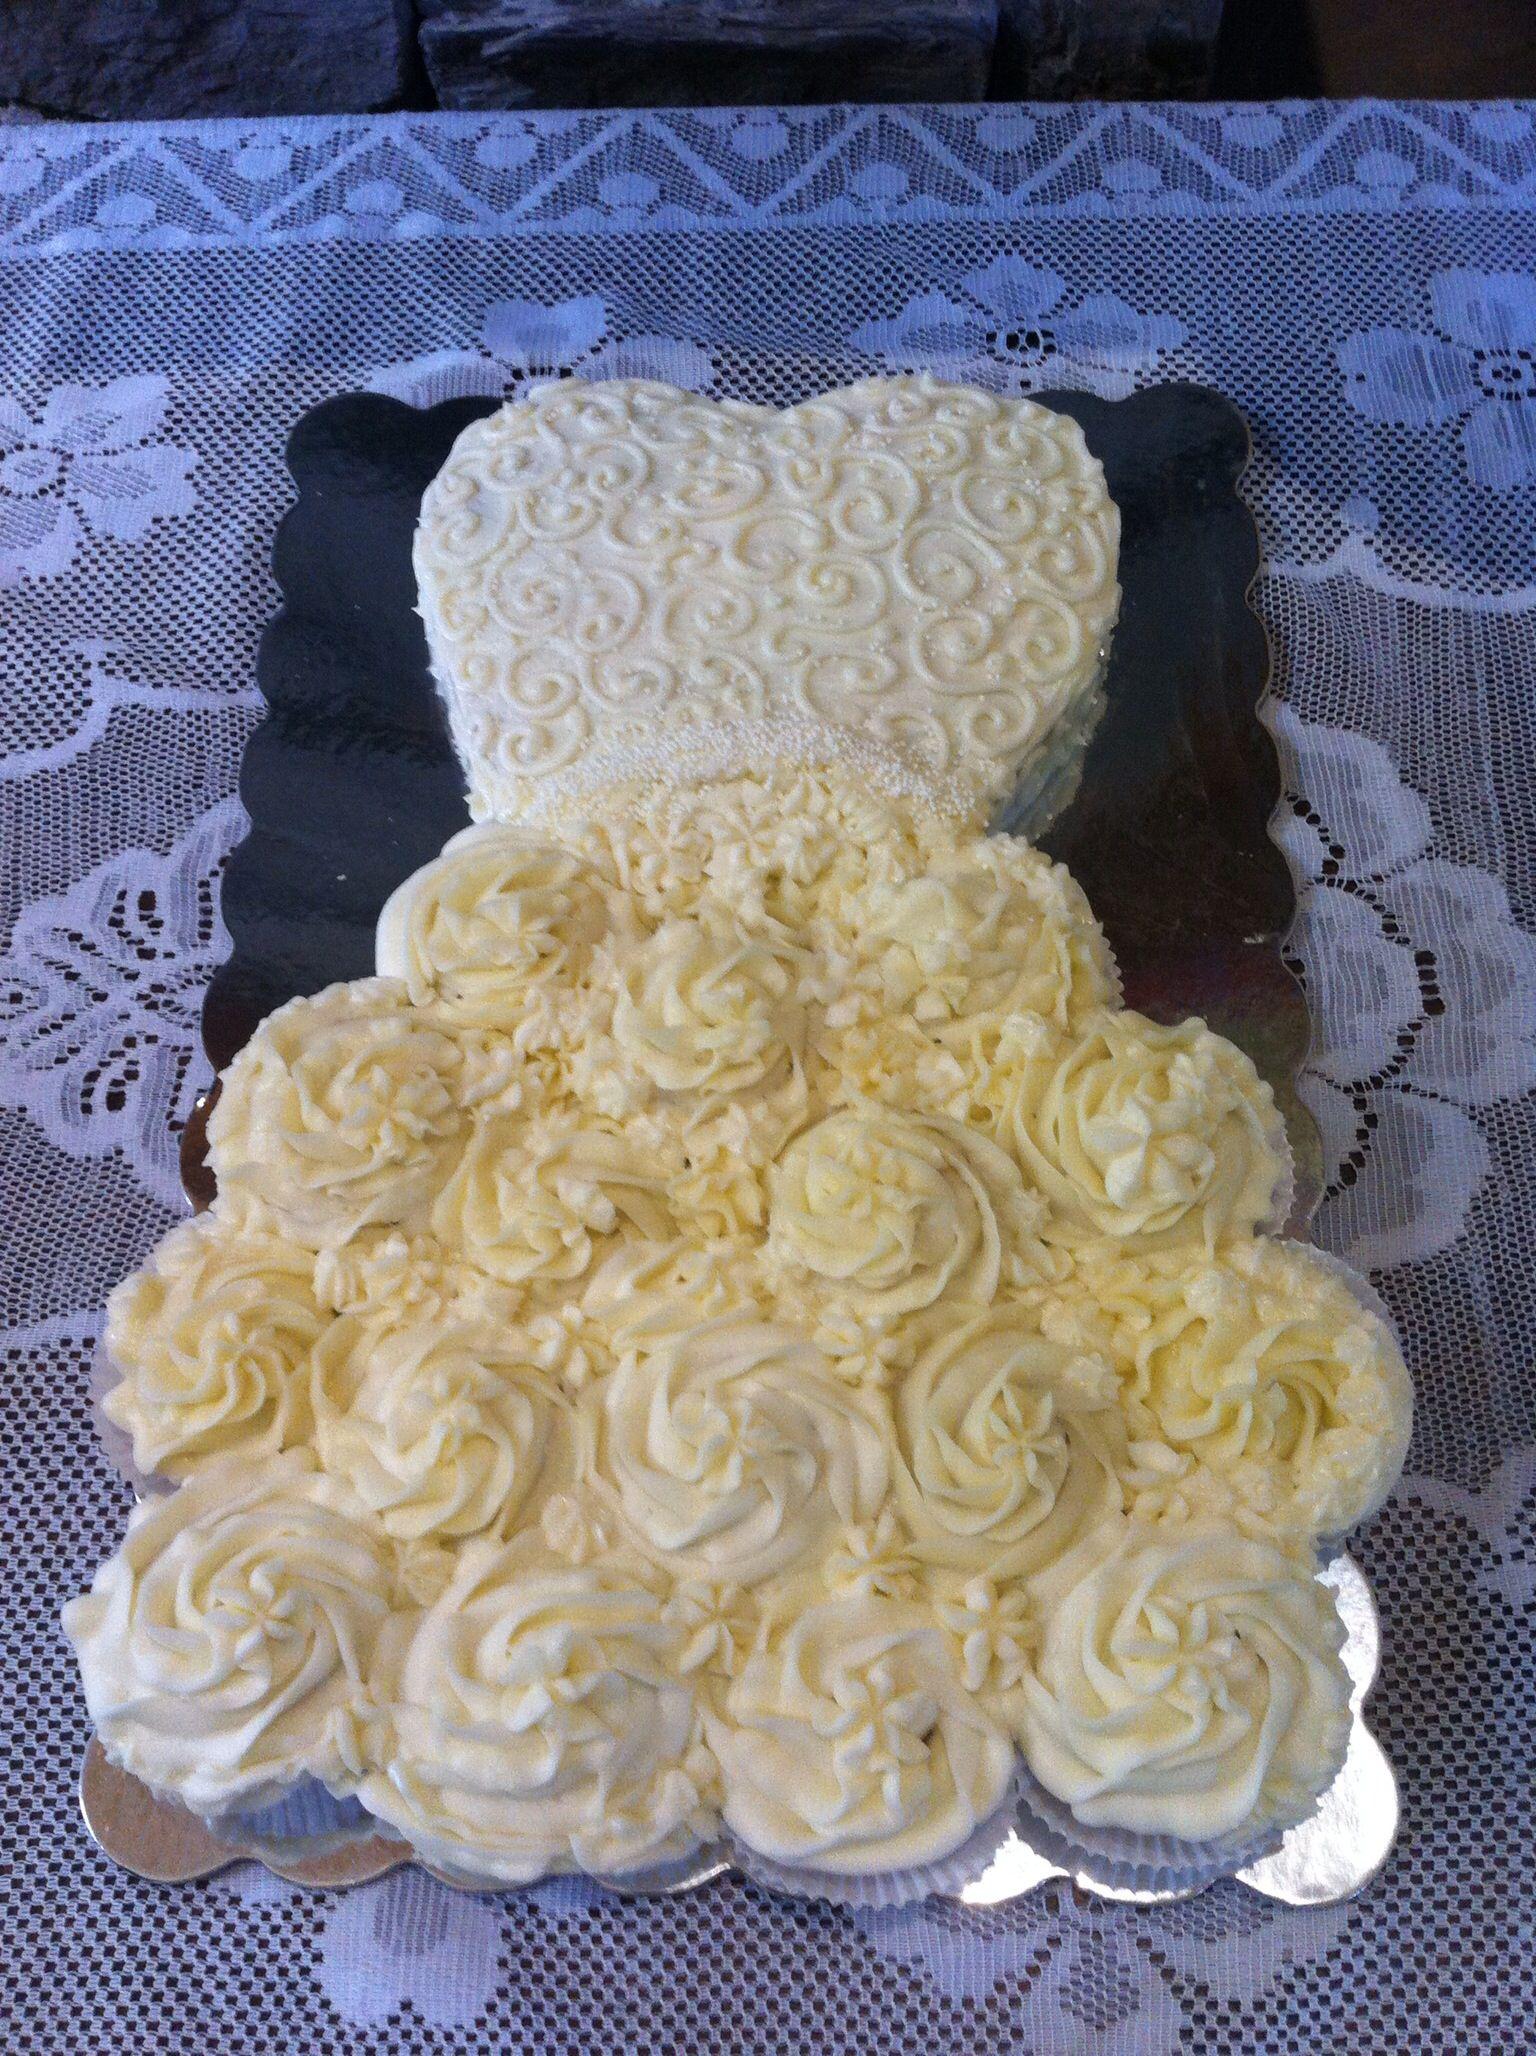 Cupcake pull apart wedding dress cake-slightly different than the ...